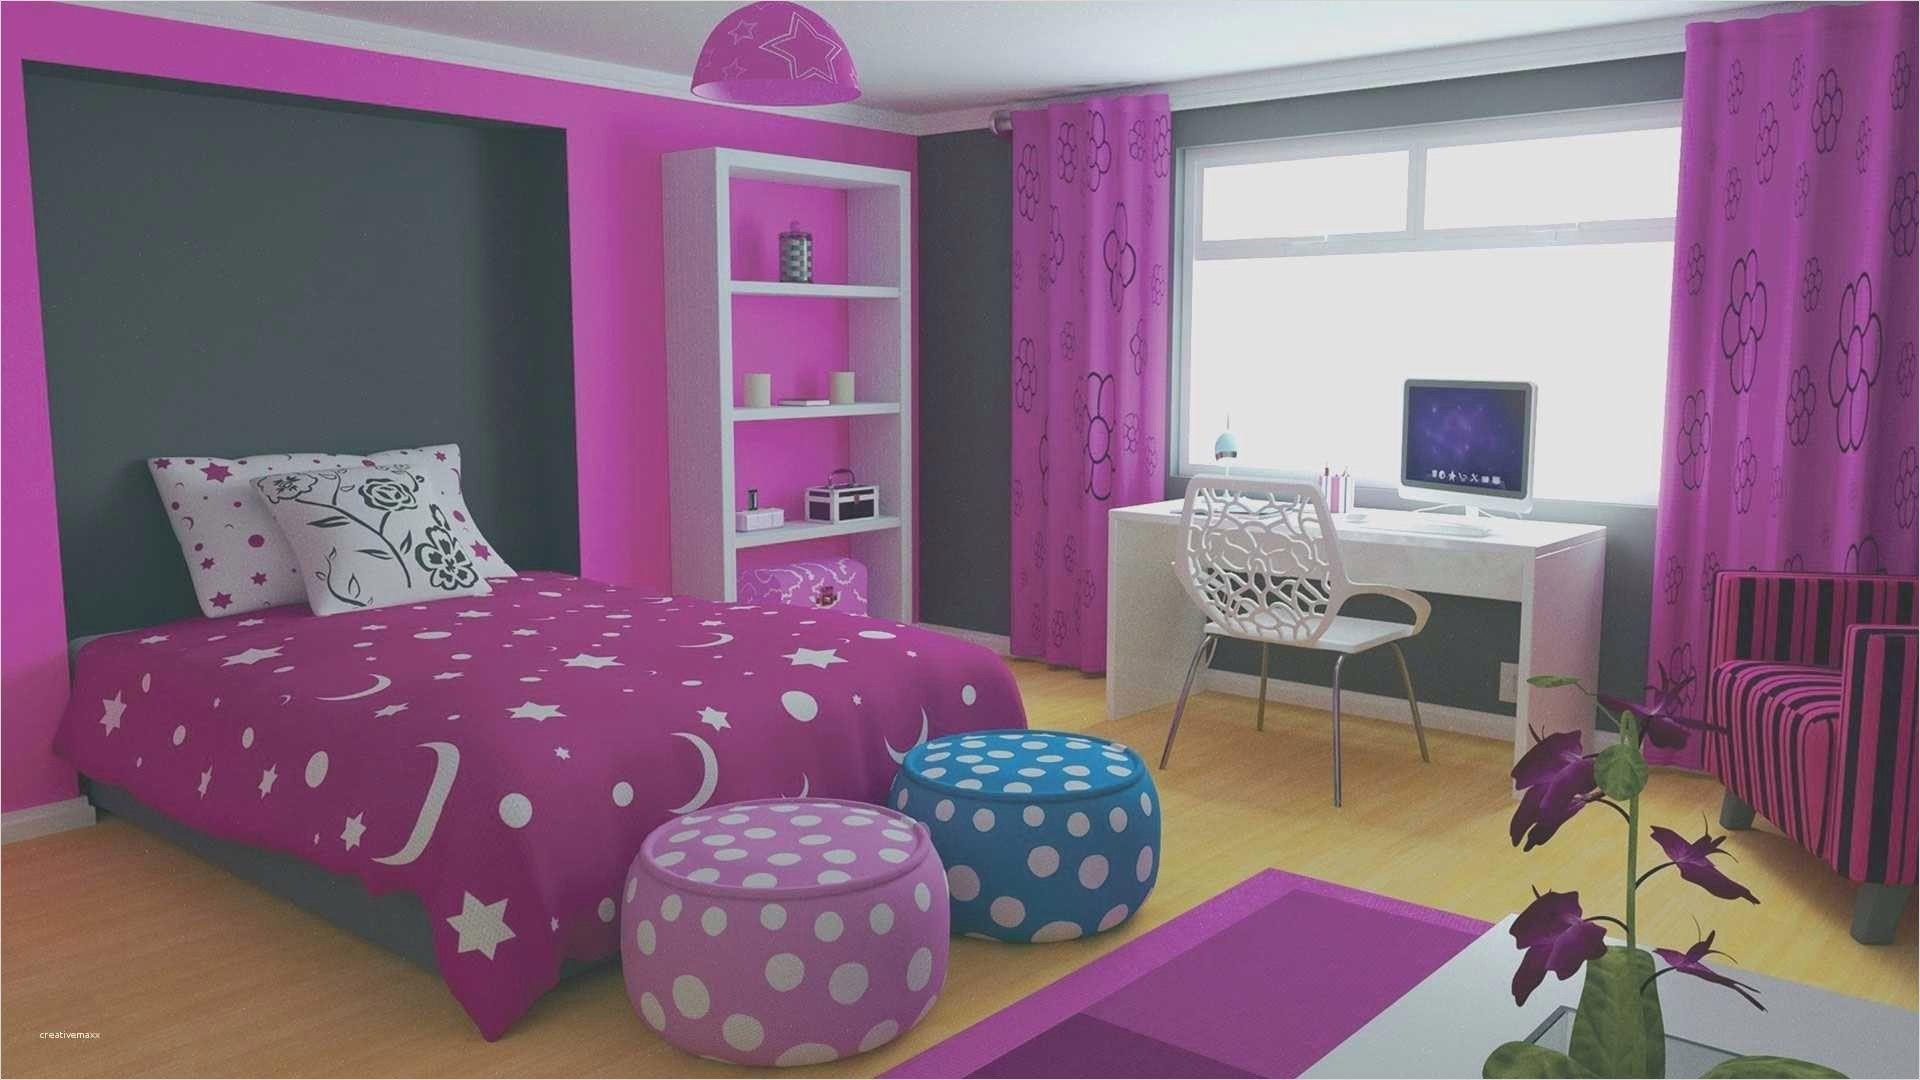 42 Stylish Bedrooms For Teenage Girls That Will Amaze You Decorewarding Purple Bedrooms Cute Bedroom Ideas Girls Room Design